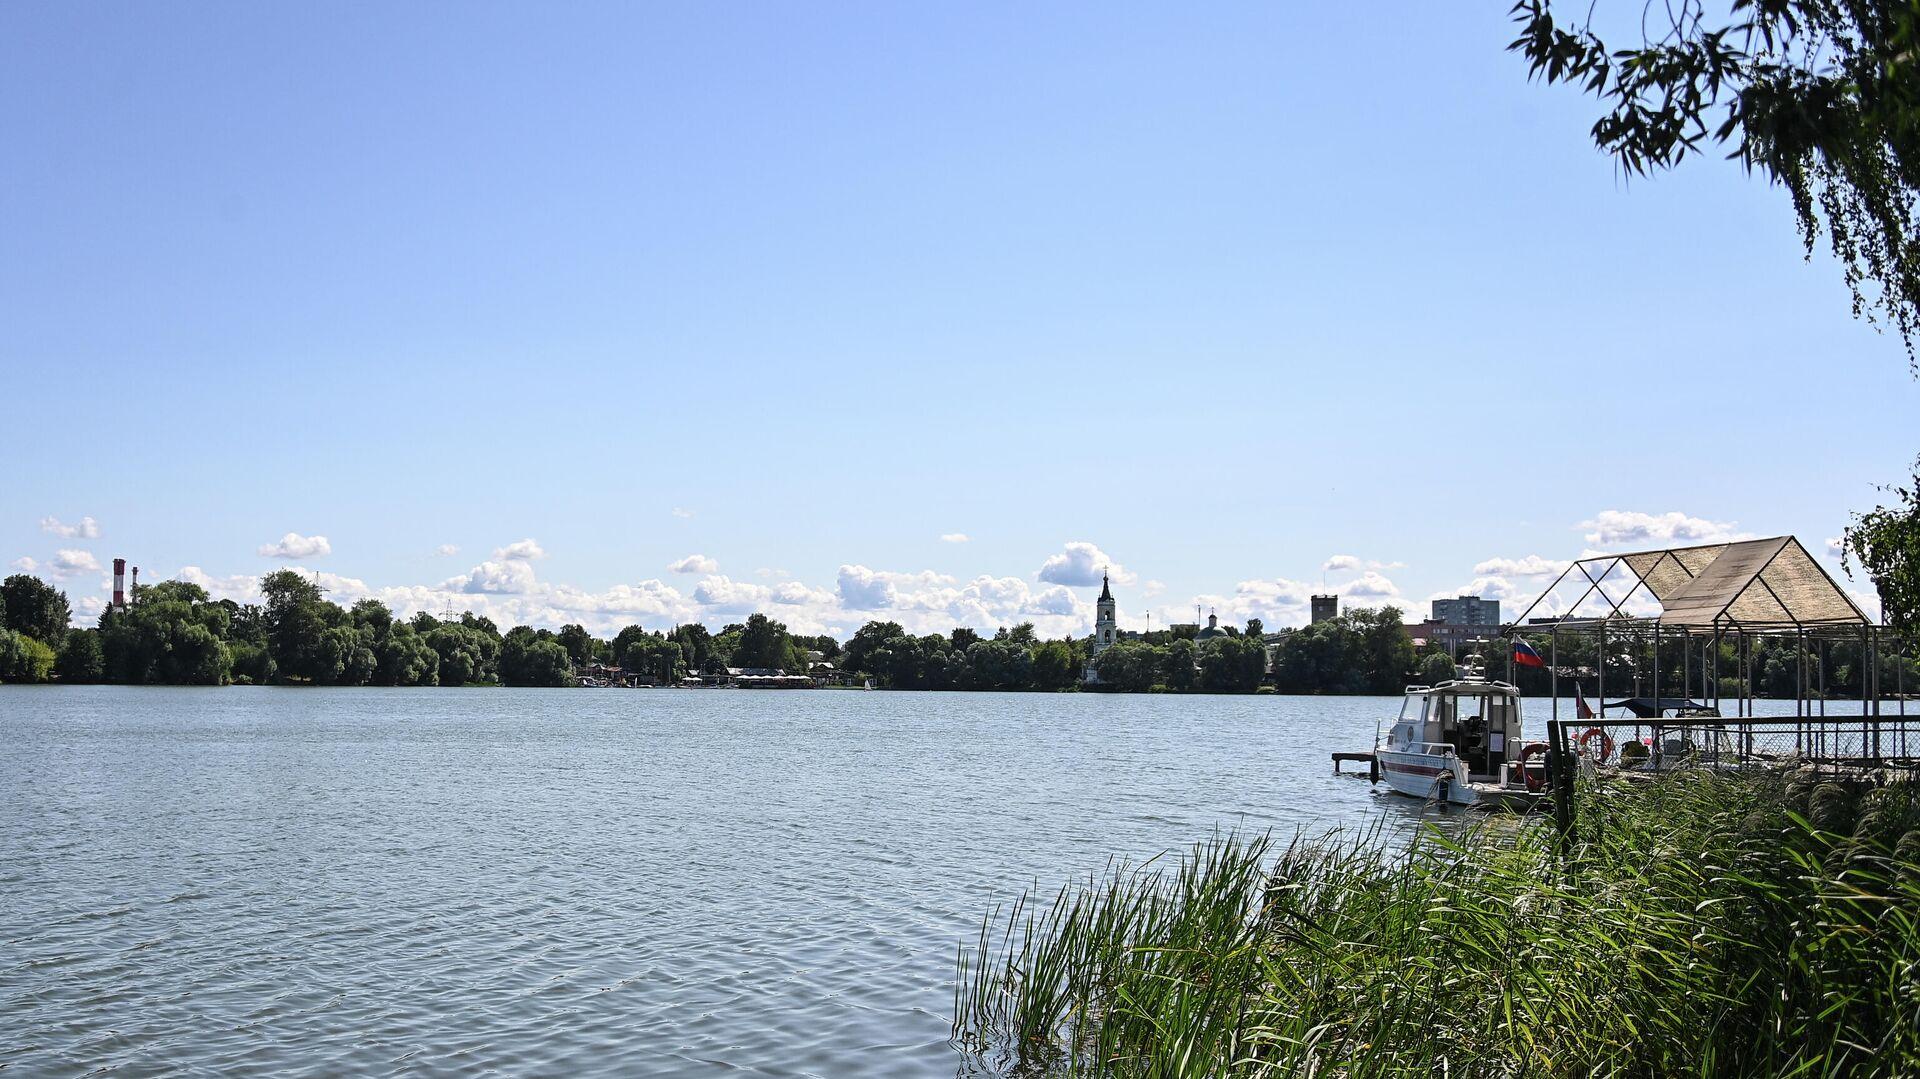 Косинские озера в Москве - РИА Новости, 1920, 04.08.2021